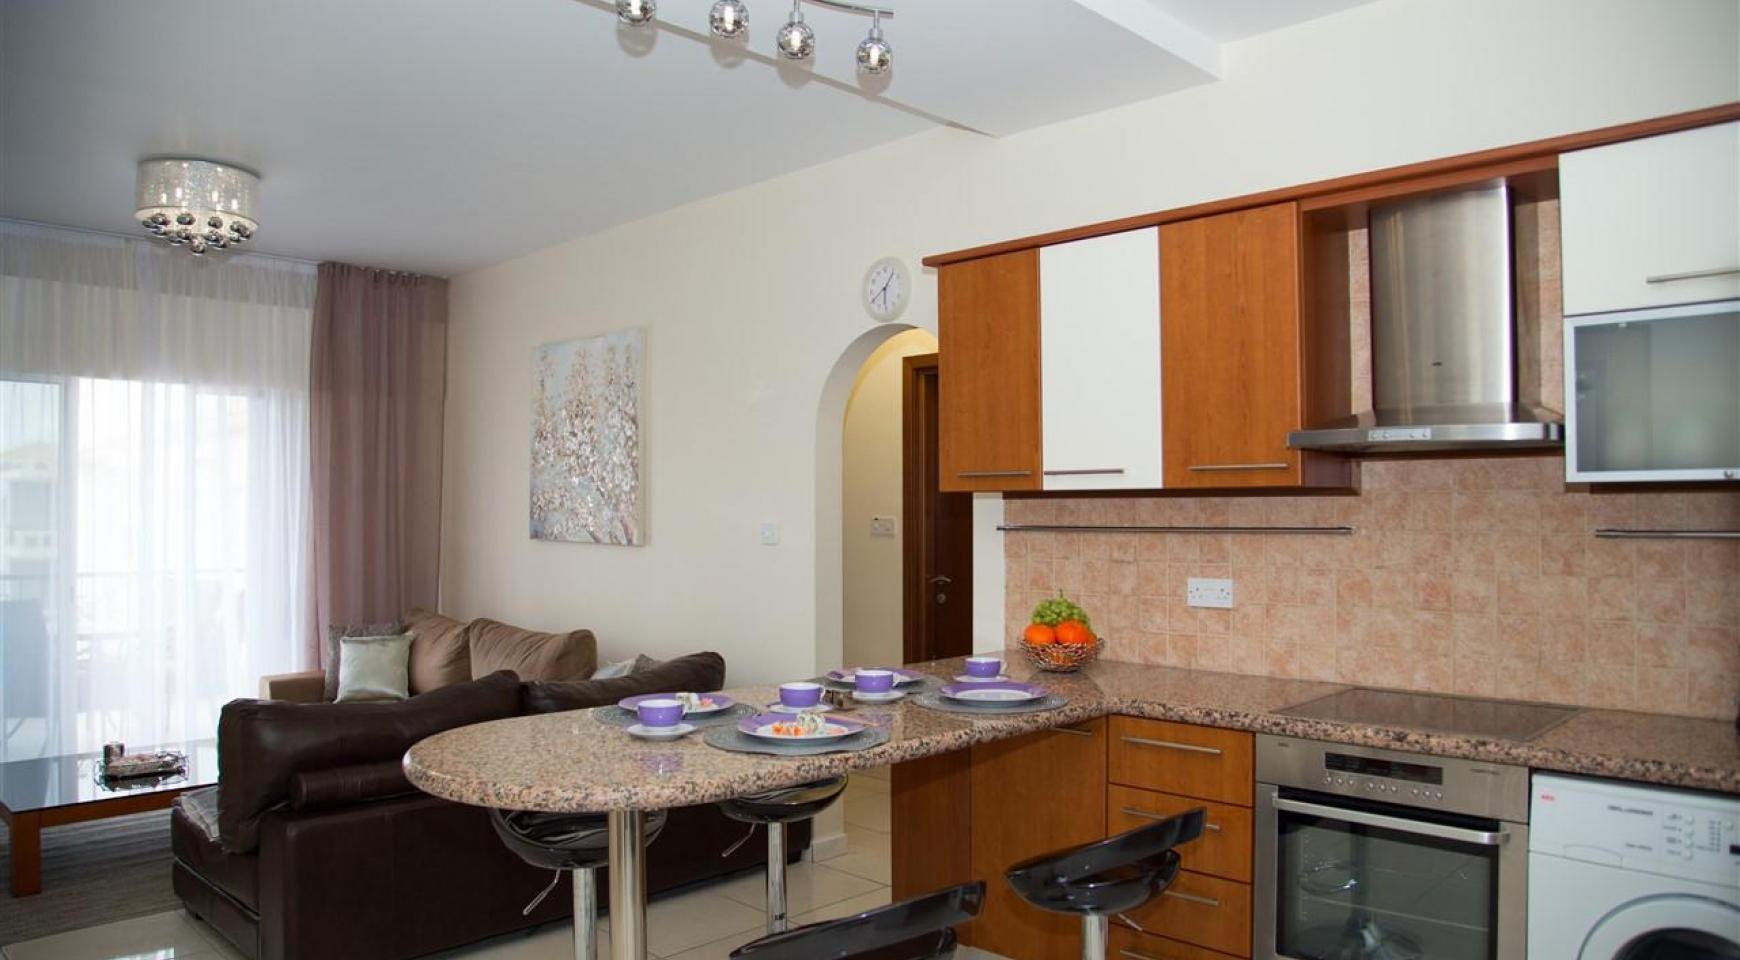 Luxury 2 Bedroom Apartment Mesogios Iris 304 in the Tourist area near the Beach - 9